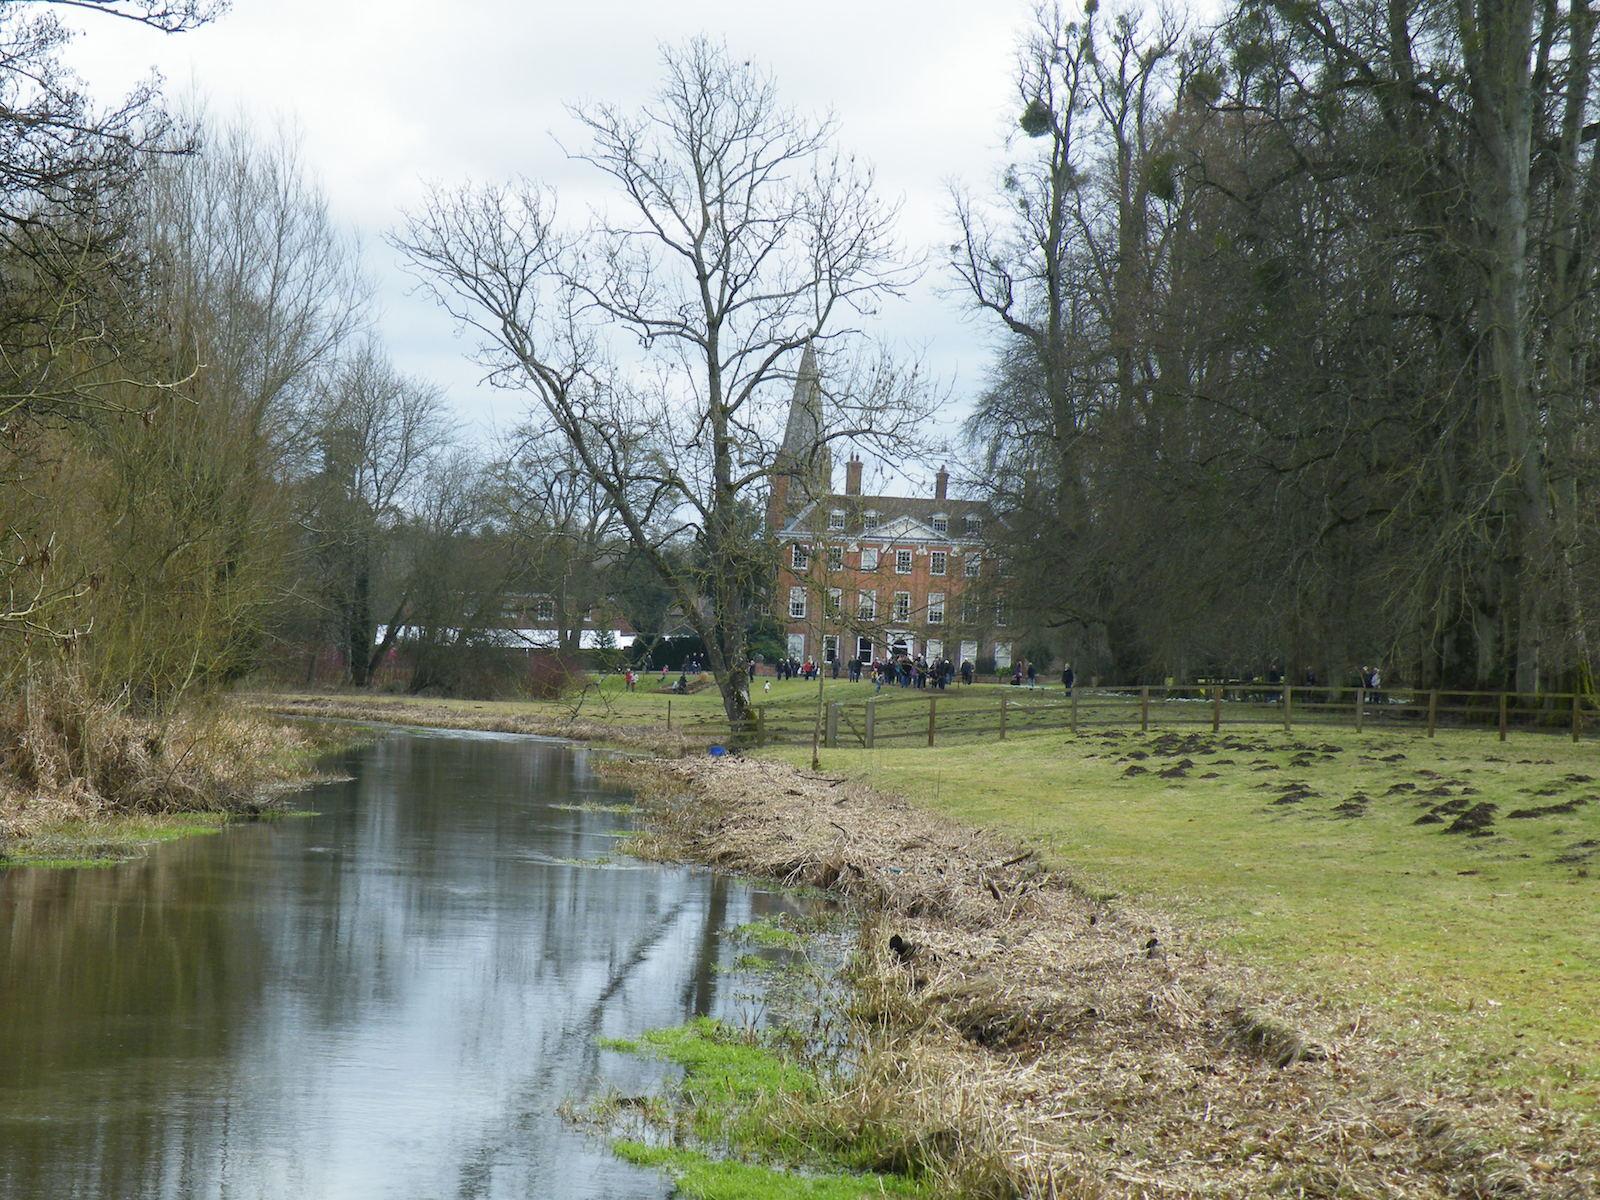 Welford House